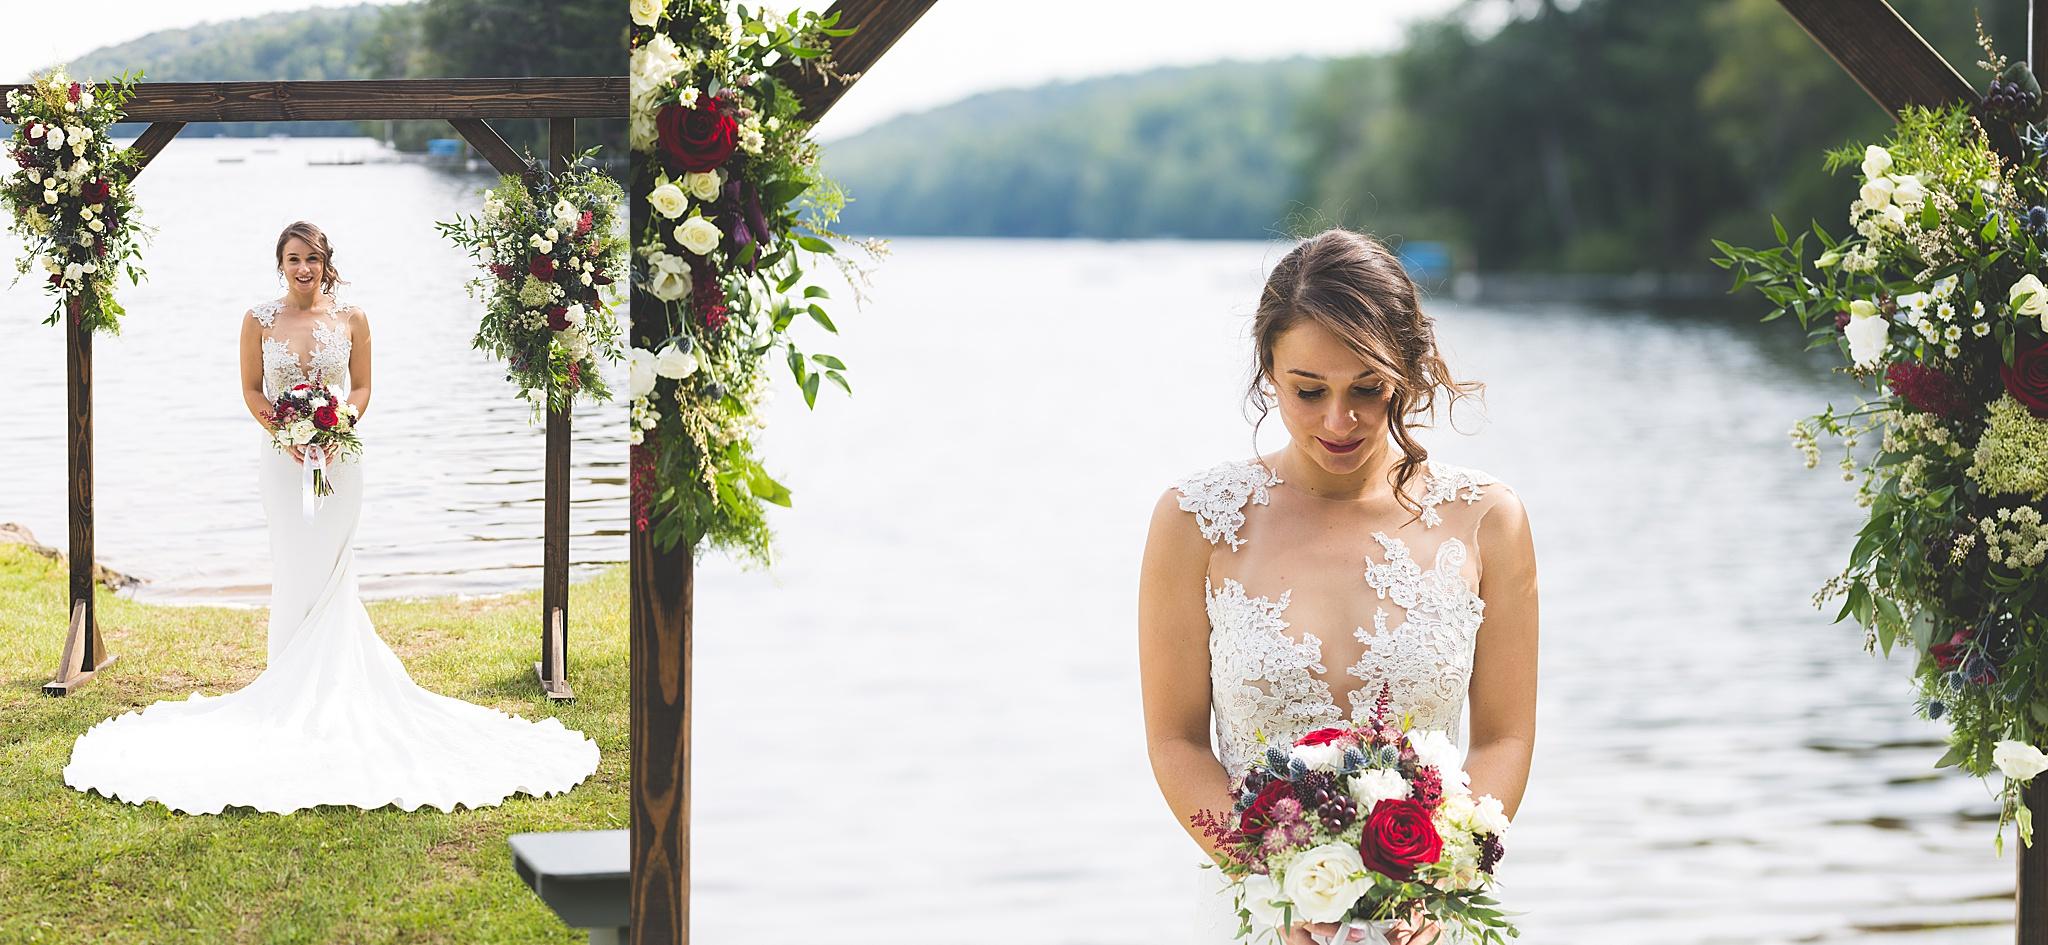 Albany_Wedding_Photographer_7504.jpg